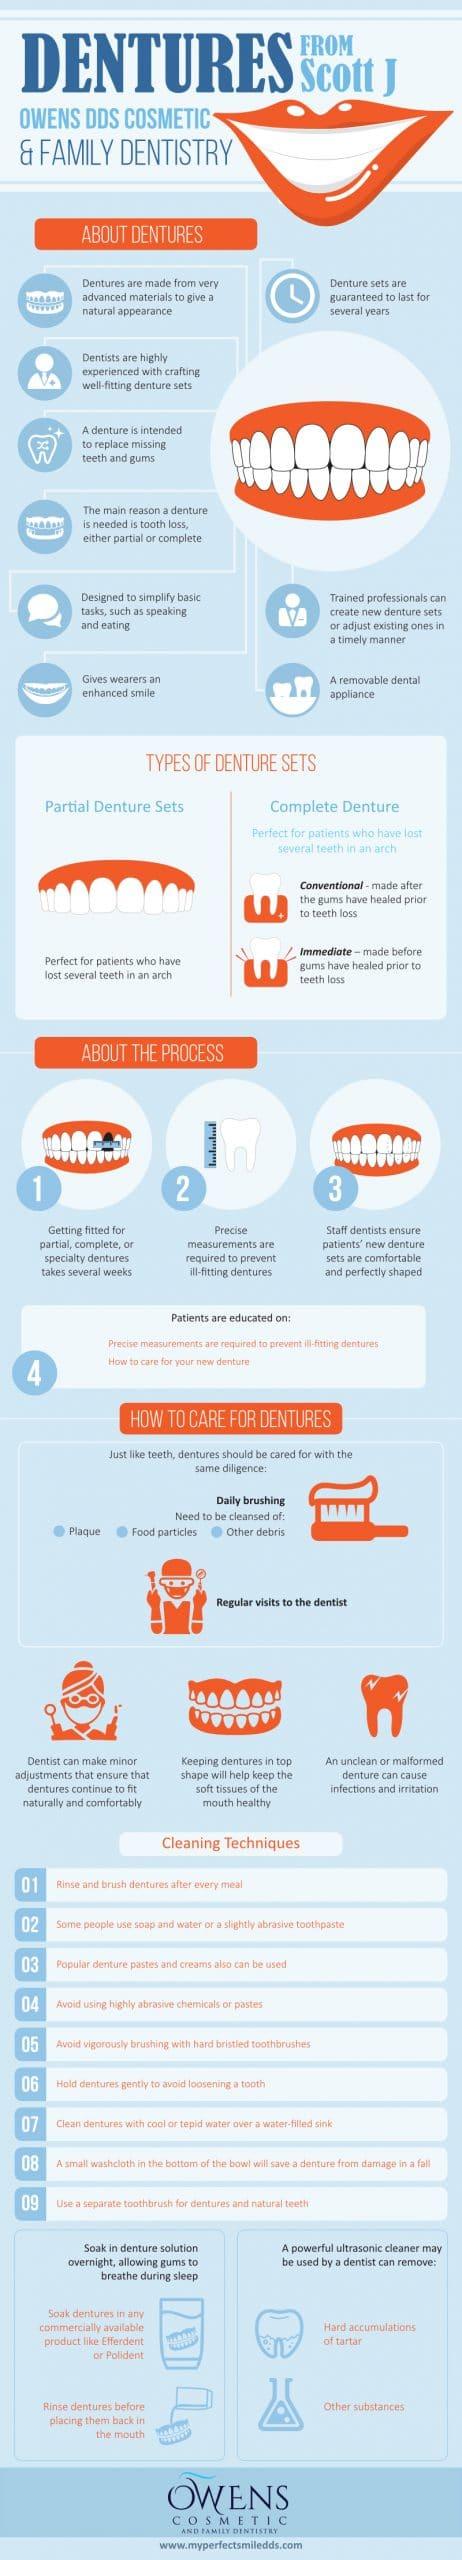 Scott J Owens DDS Cosmetic & Family Dentistry